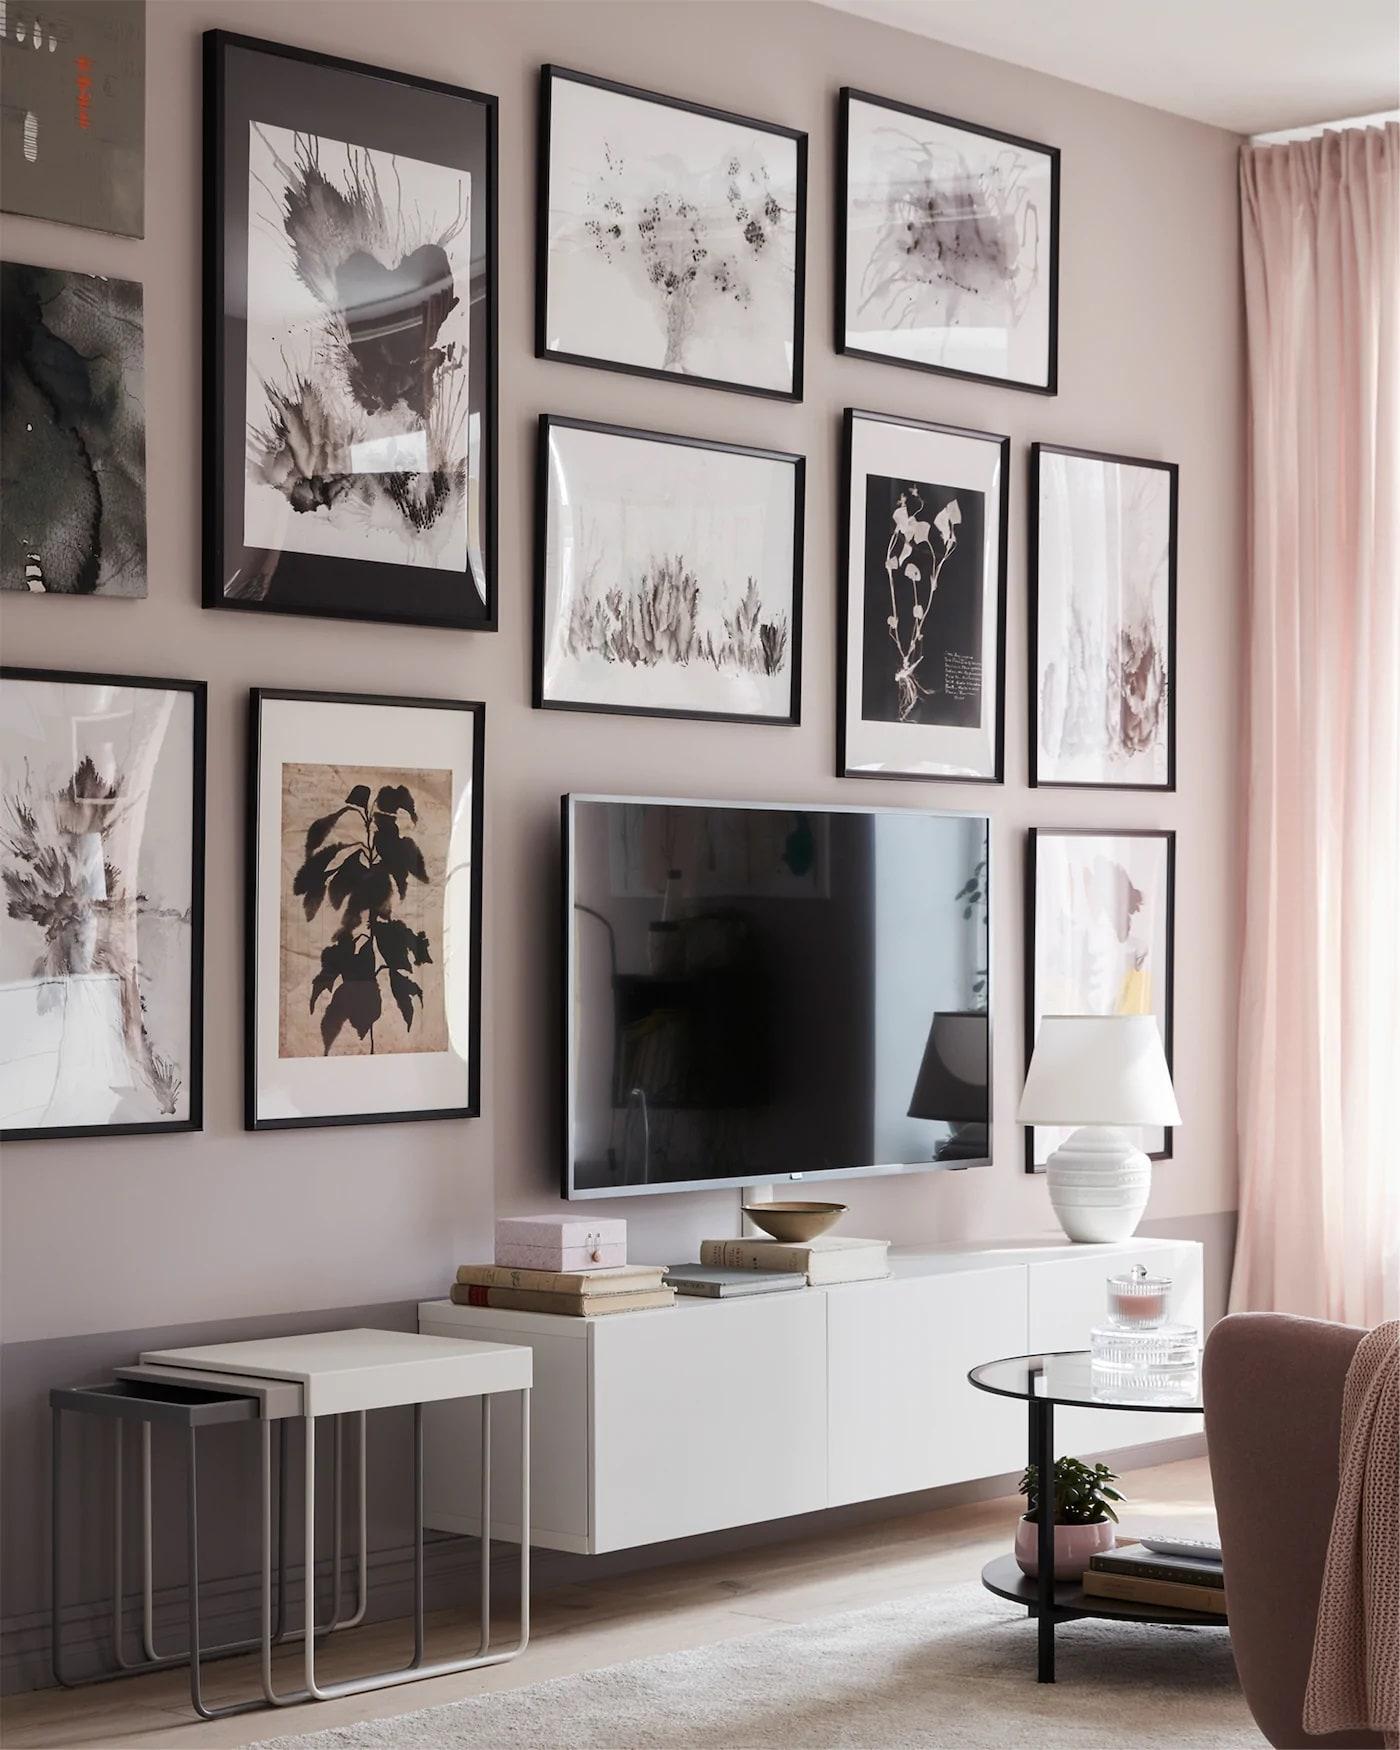 ikea duvar aksesuarlari ile dekorasyon fikirleri (18)-min